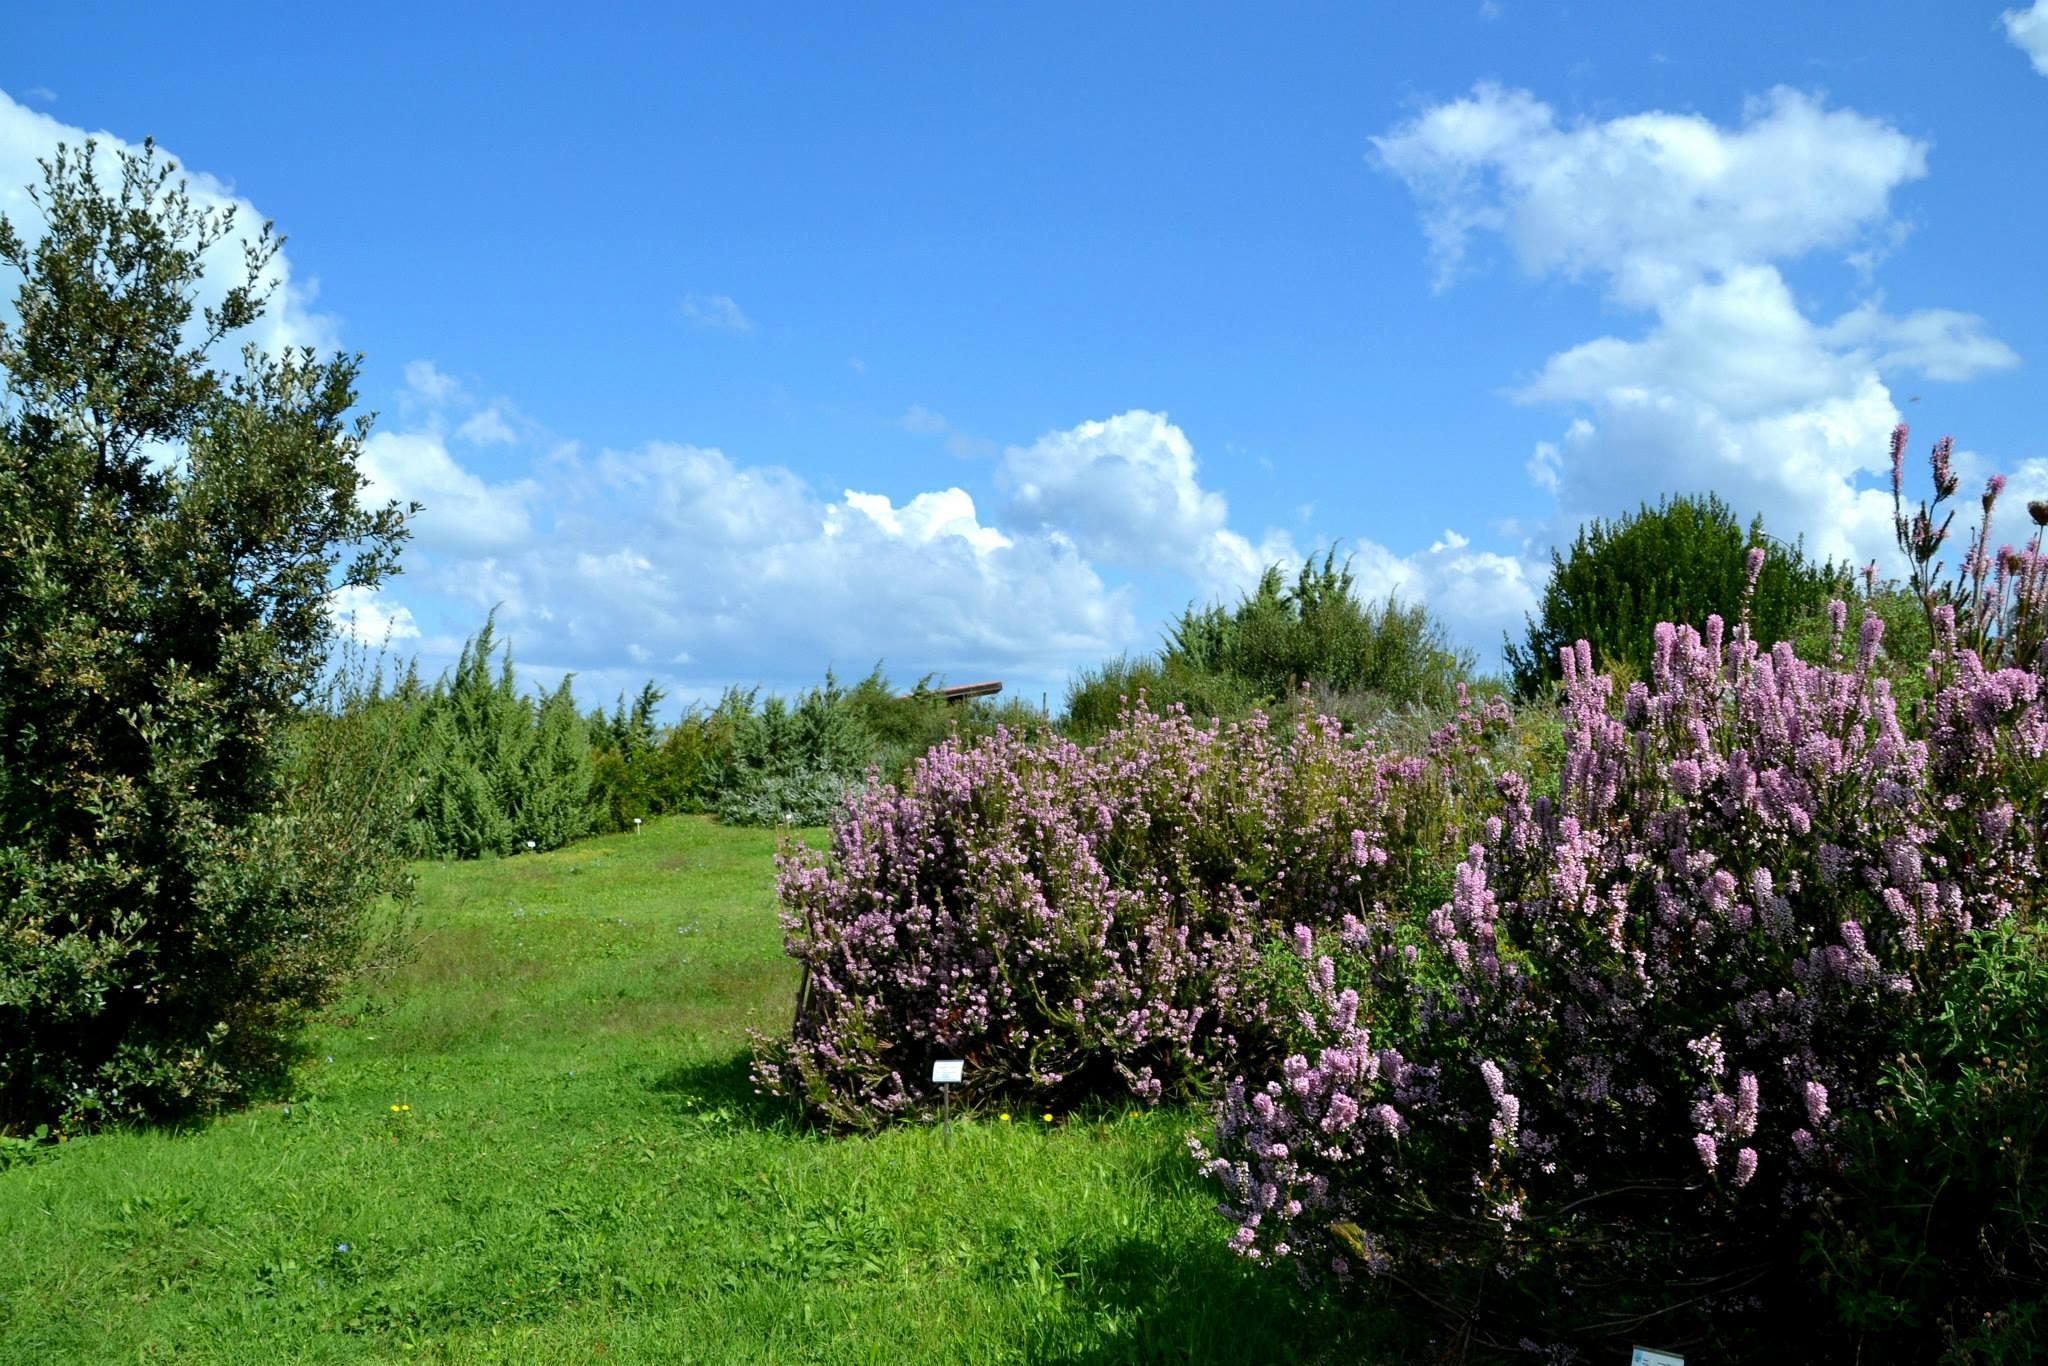 Giardino botanico mediteranneo (Potenza) / FAI (Fondo Ambiente italiano)